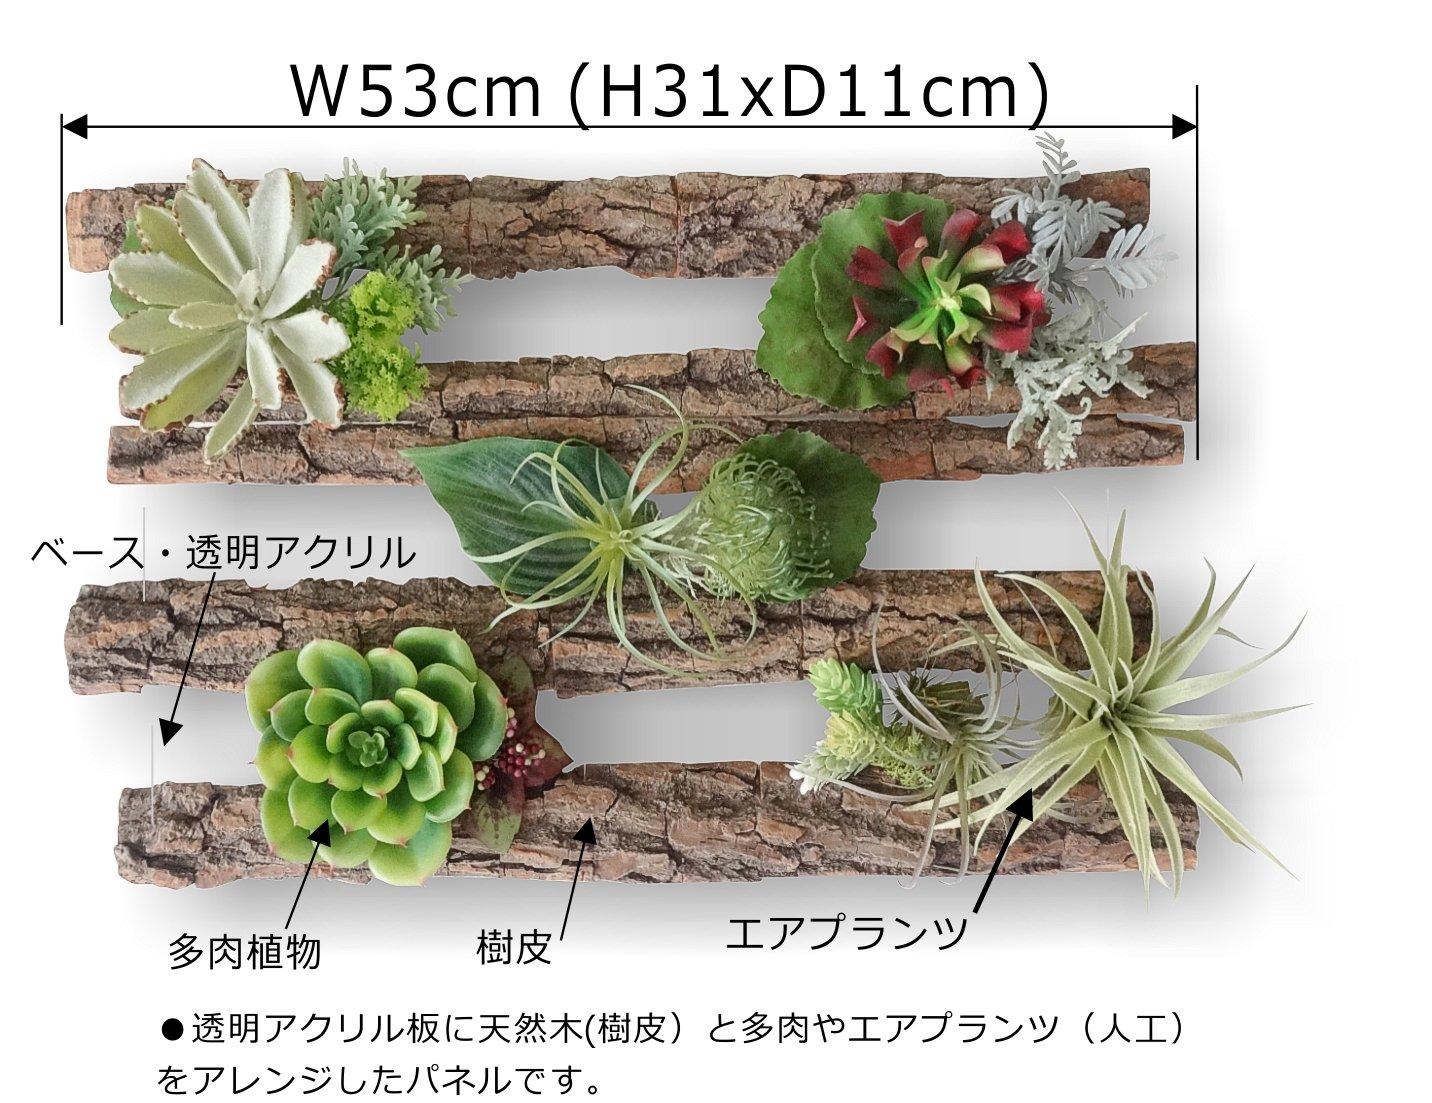 a-woodベース透明アクリルサイズ 53x31x奥行き11cm B0773MRX4G